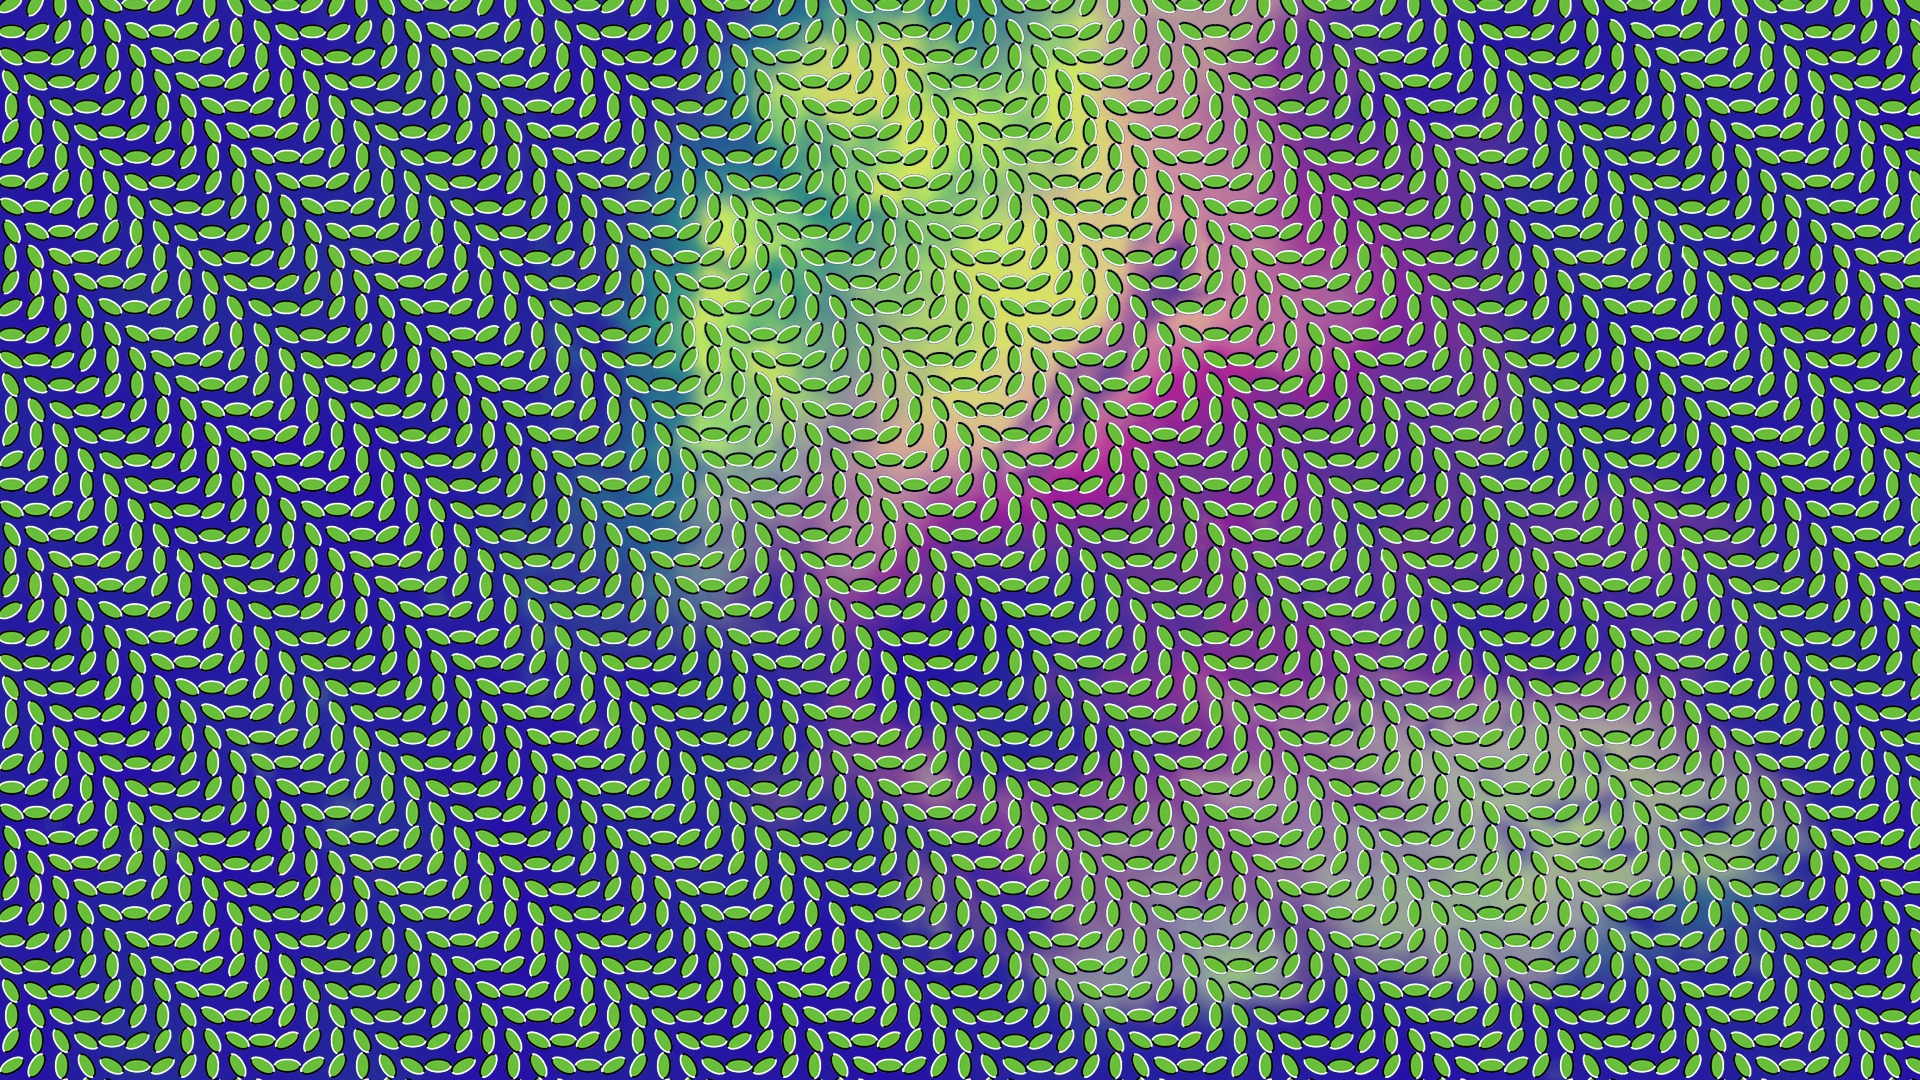 Mac Moving Wallpaper Hd Hd Optical Illusion Backgrounds Pixelstalk Net